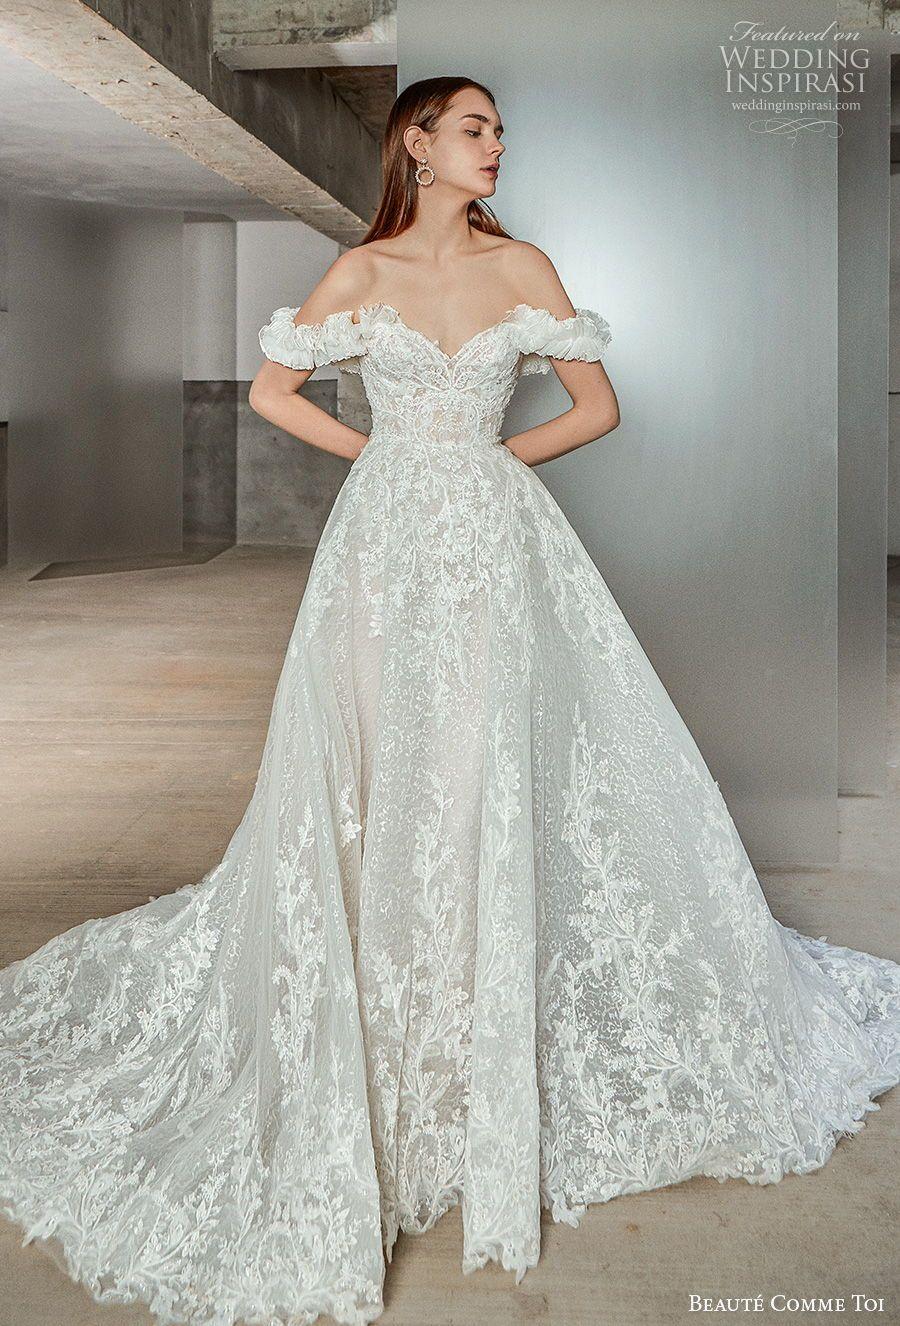 Beaute Comme Toi Spring Summer 2021 Wedding Dresses Chandelier Bridal Collection Wedding Inspirasi Designer Bridal Gowns Wedding Dresses Lace Boho Wedding Dress [ 1326 x 900 Pixel ]